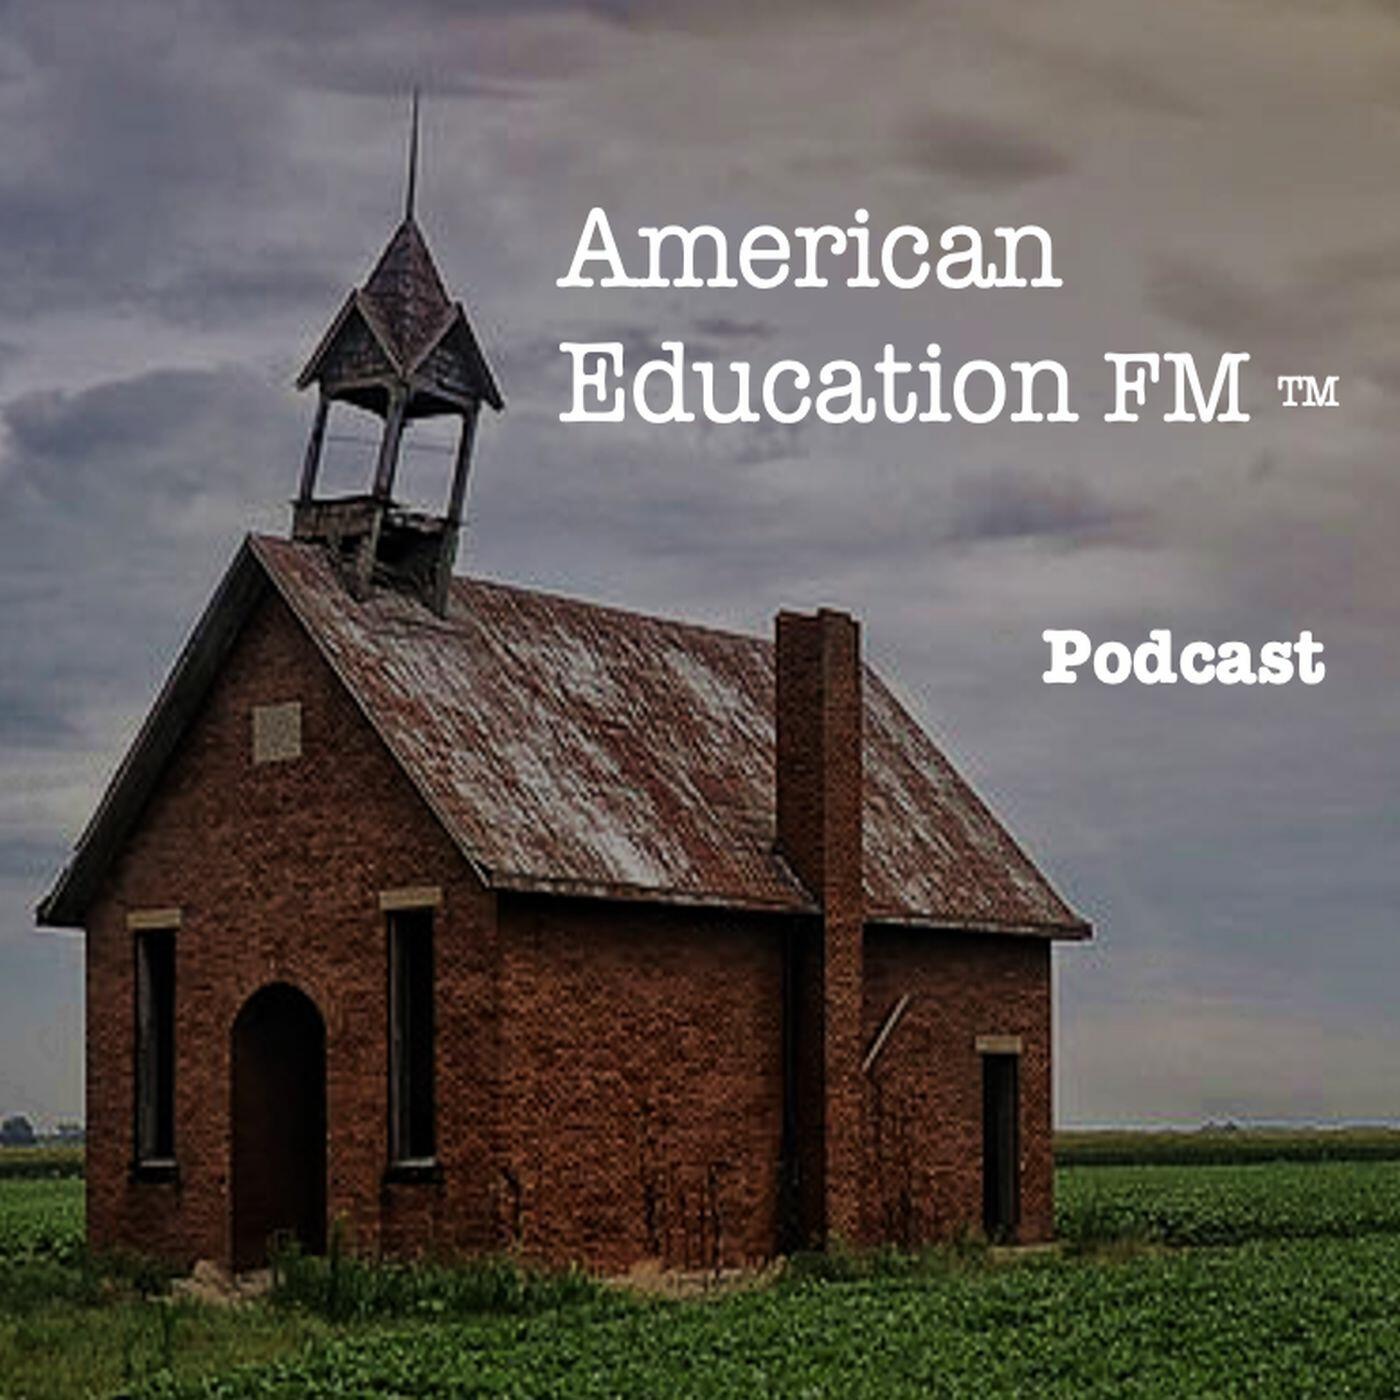 American Education FM